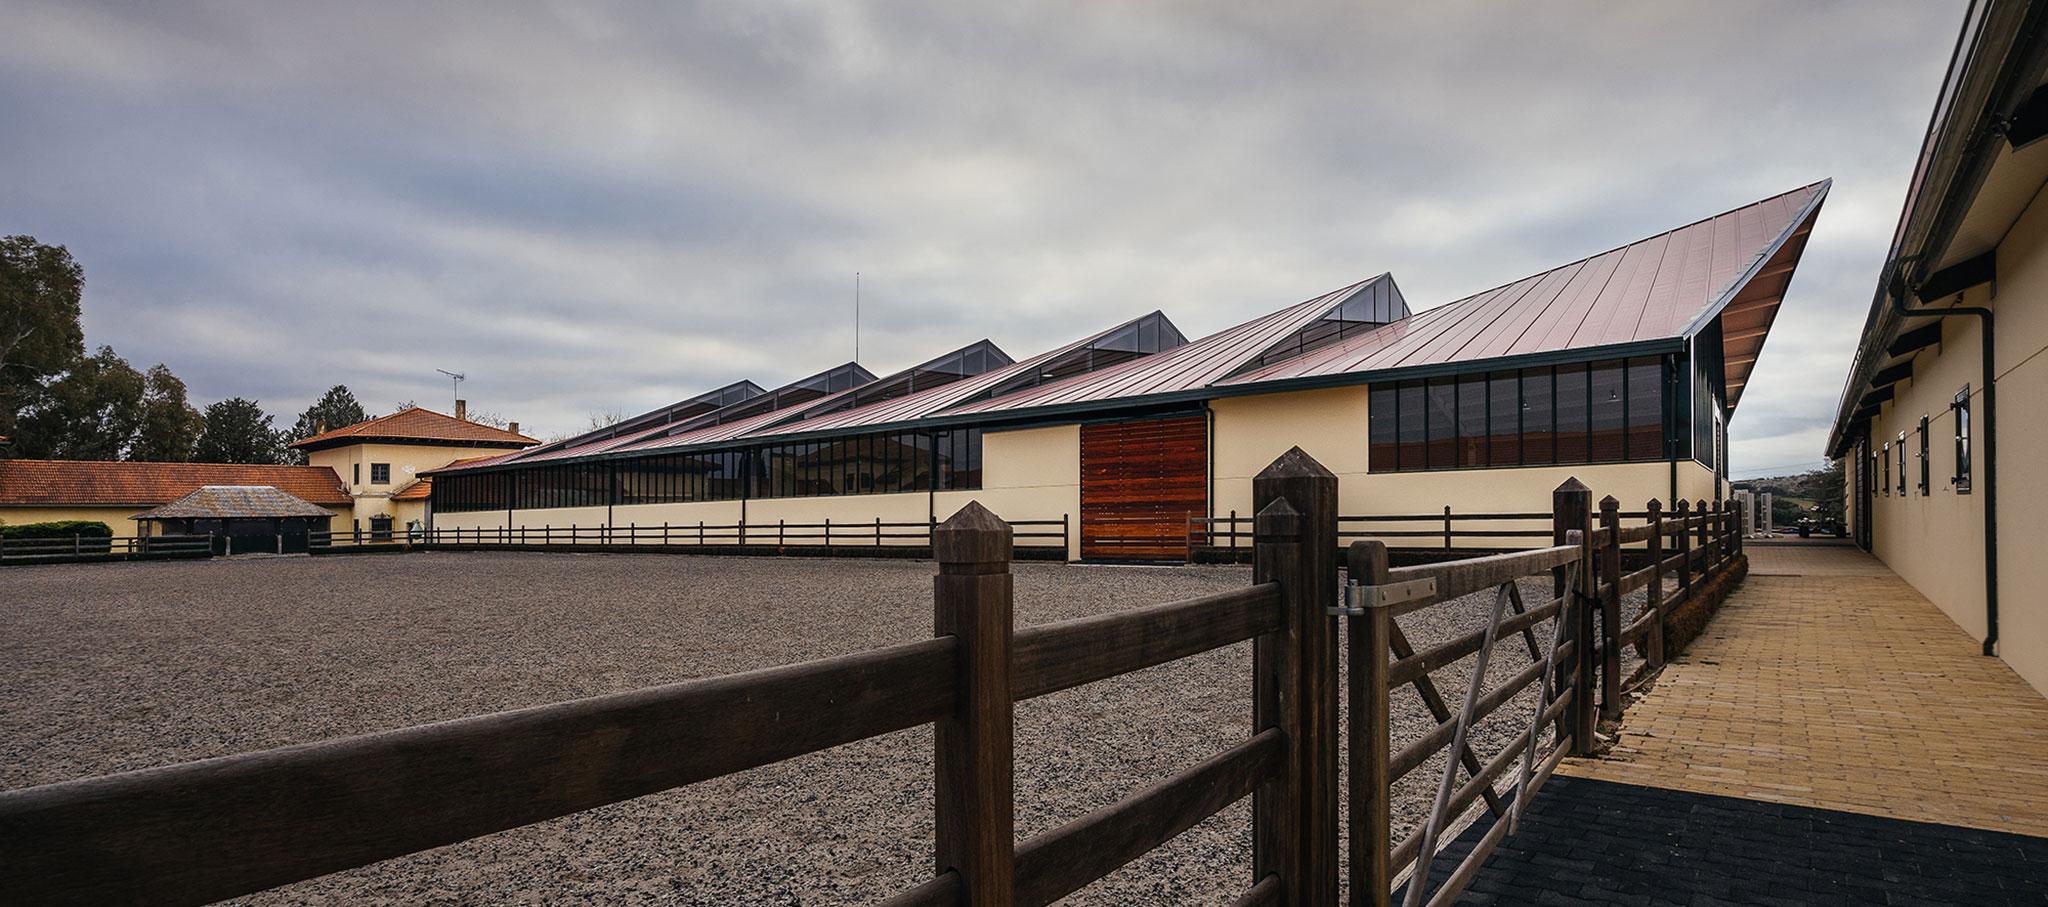 Exterior view. Horse Ridding Field in cattle Farm by OOIIO Arquitecture. Photograph of OOIIO Arquitectura, Josefotoinmo